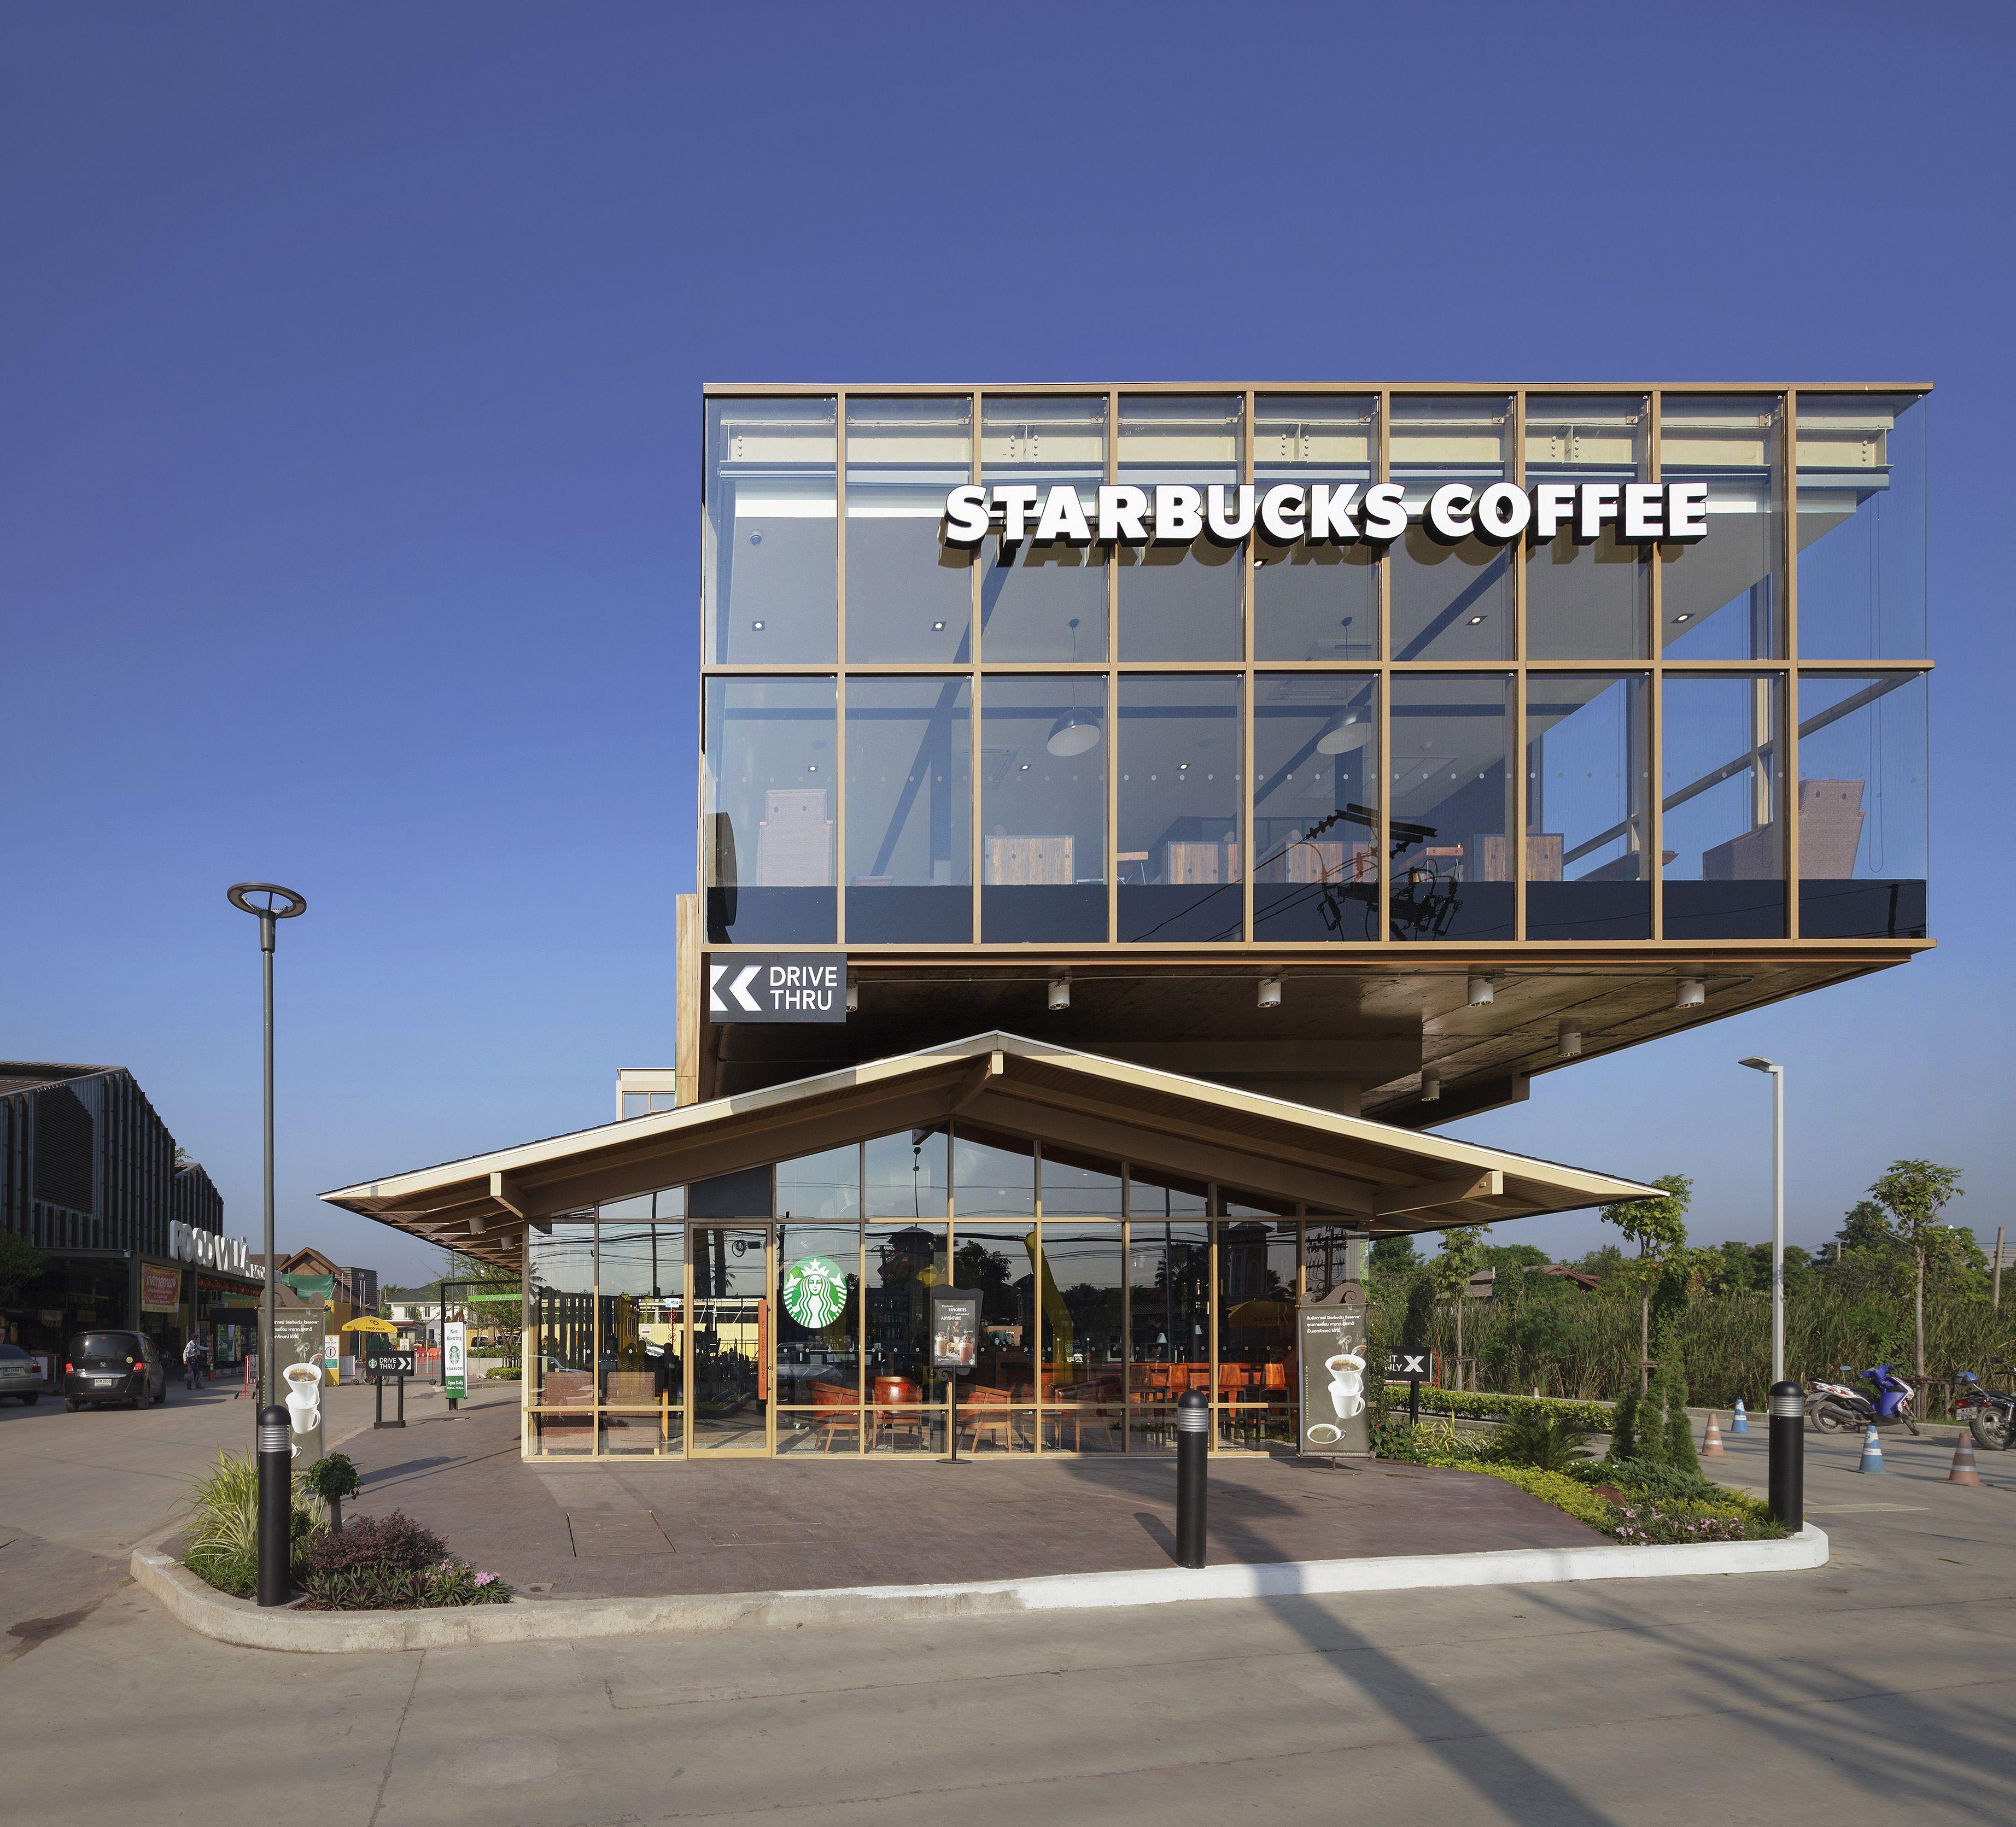 Starbucks food villa is located at food villa market for 2 story steel building